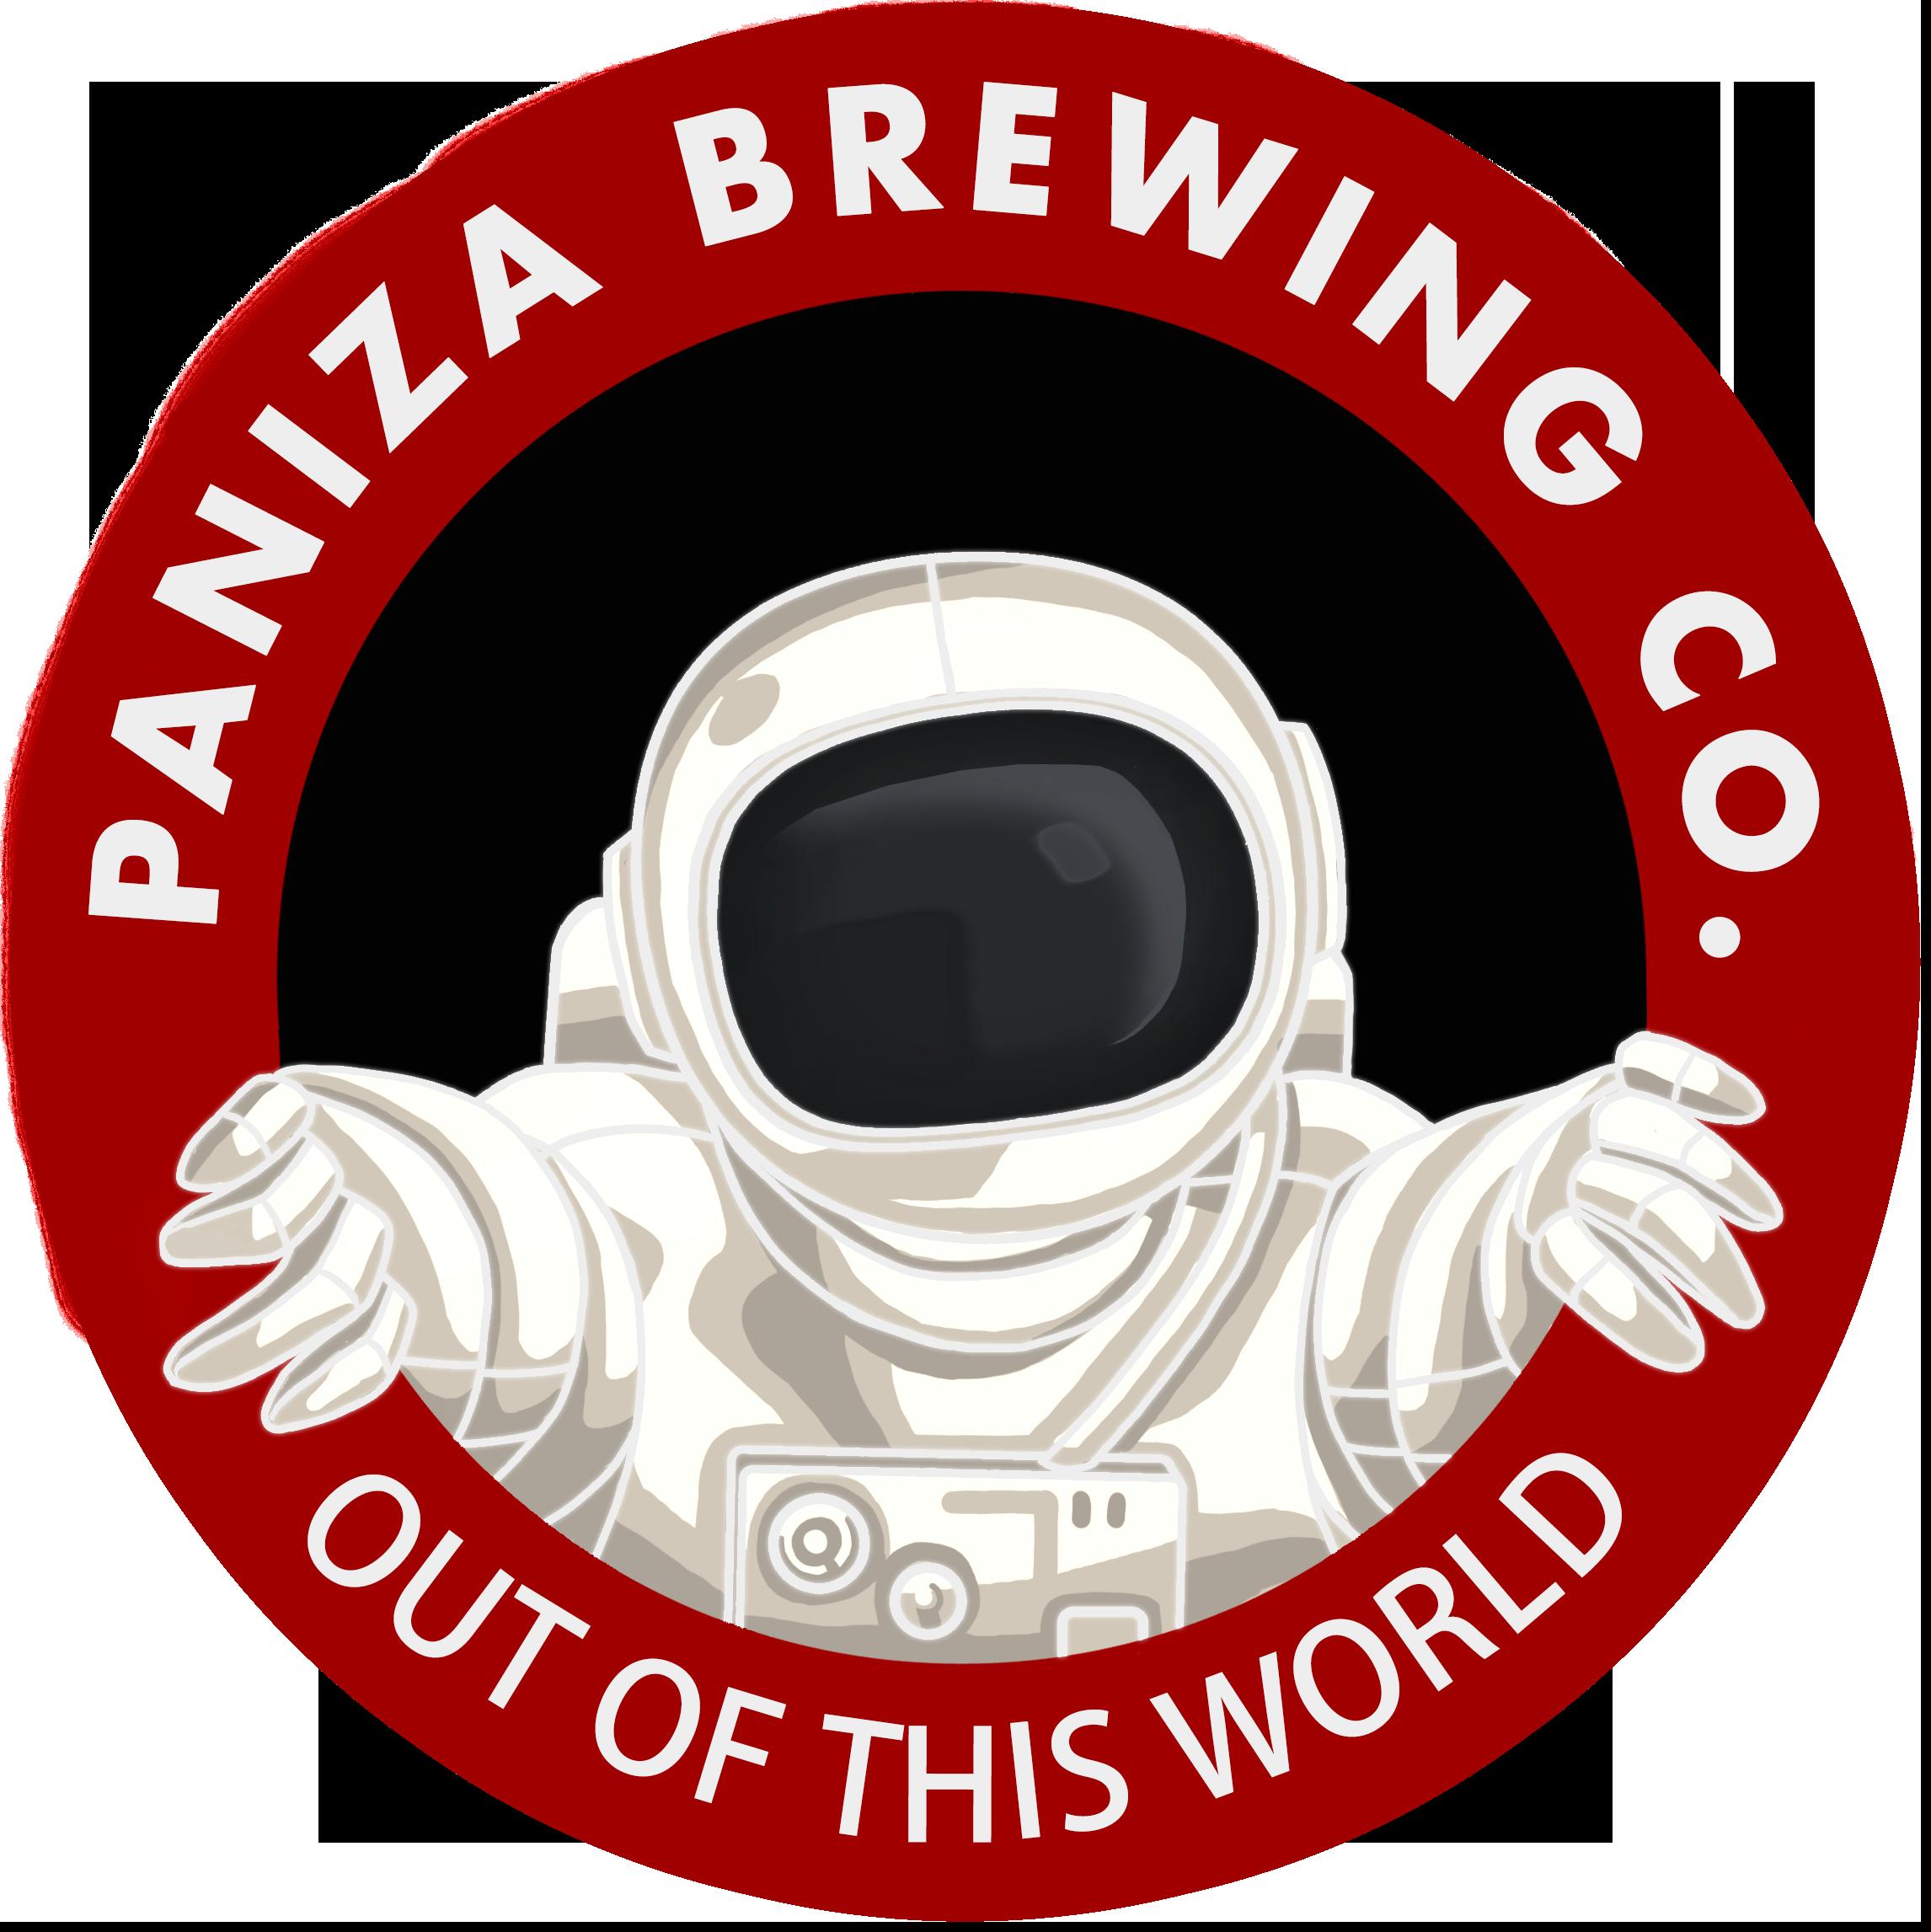 paniza_brewing_co_logo_2019_07_07_cropped.png